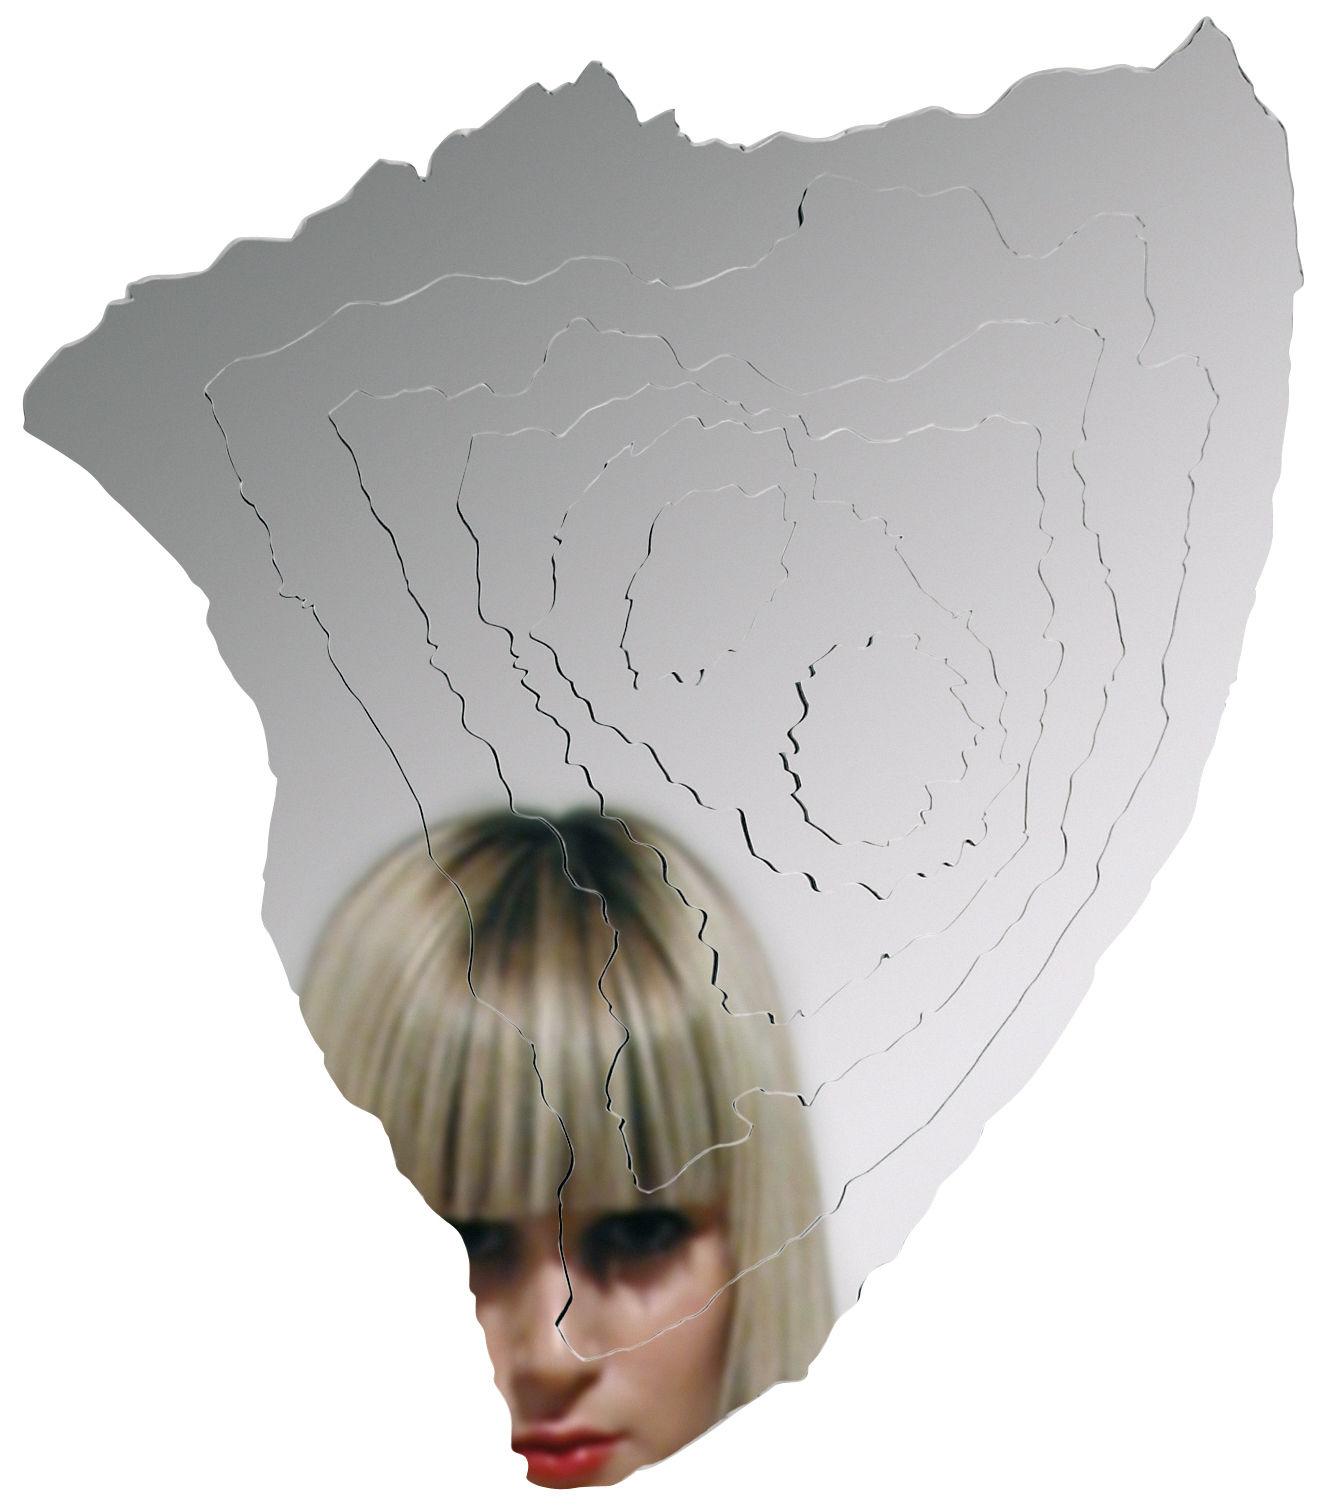 Möbel - Spiegel - Strates Selbstklebende Spiegel selbstklebend - Domestic -  - Plastikmaterial